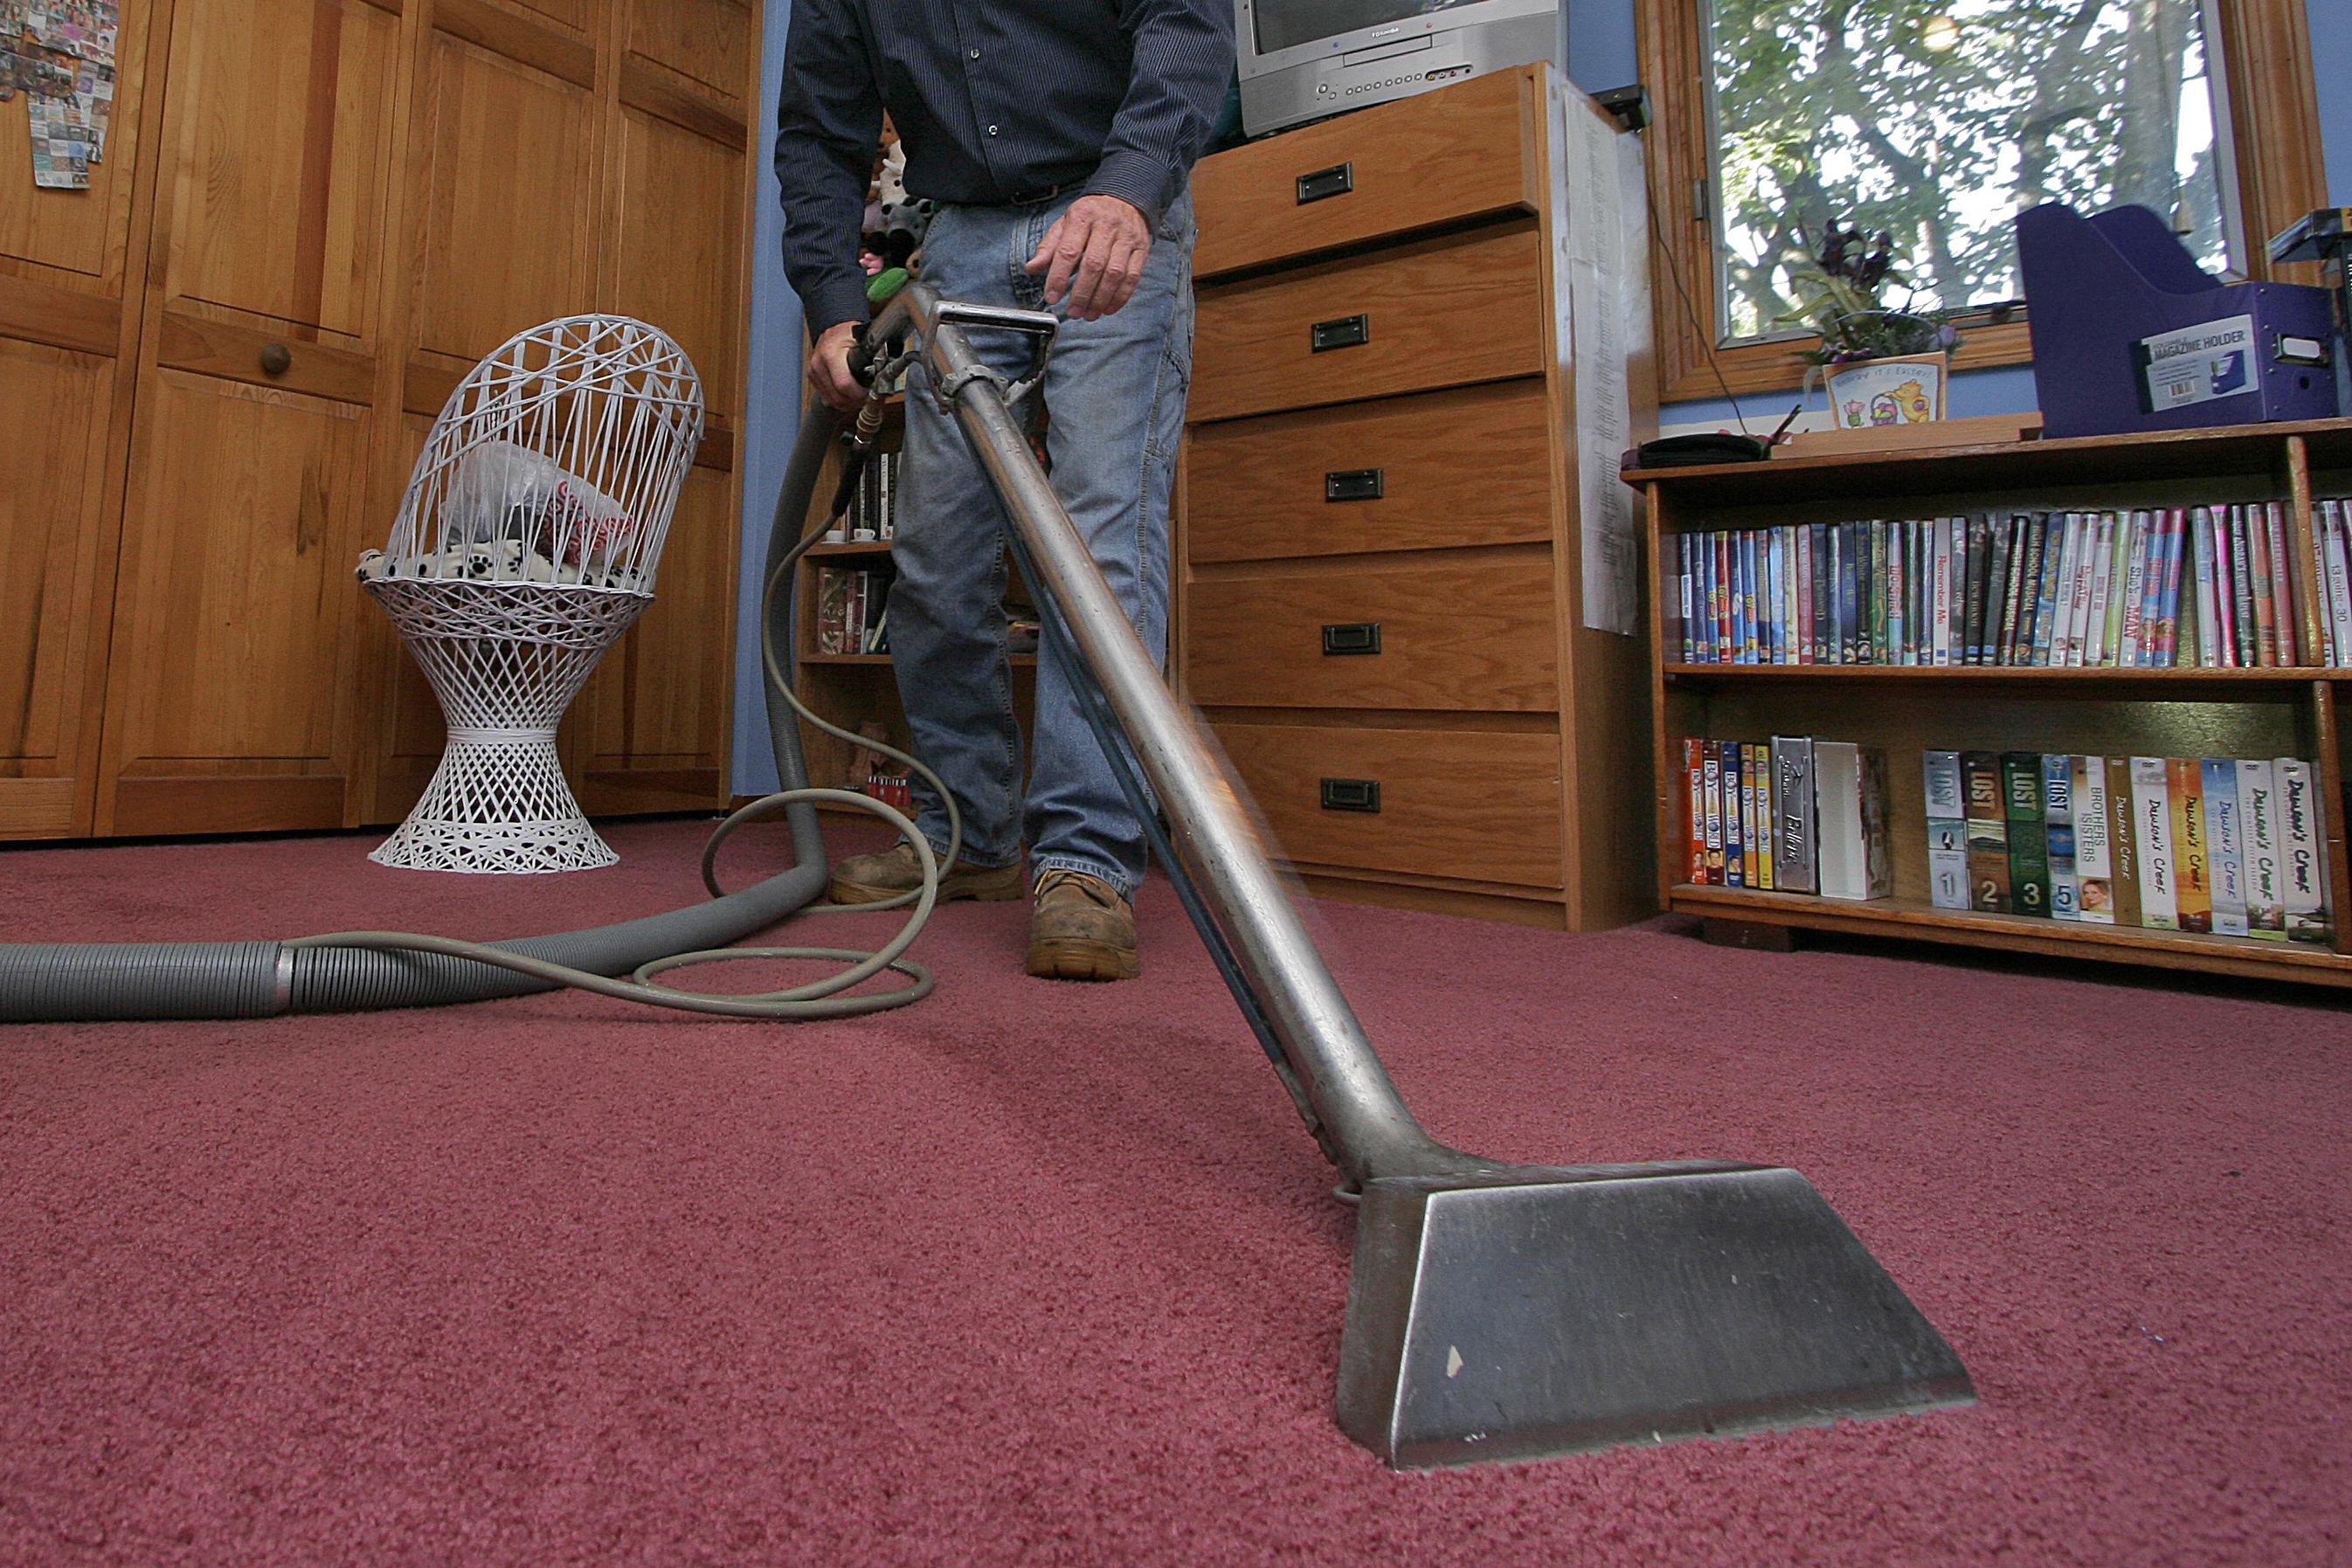 Soho Carpet Cleaning Organic Carpet Cleaning 646 776